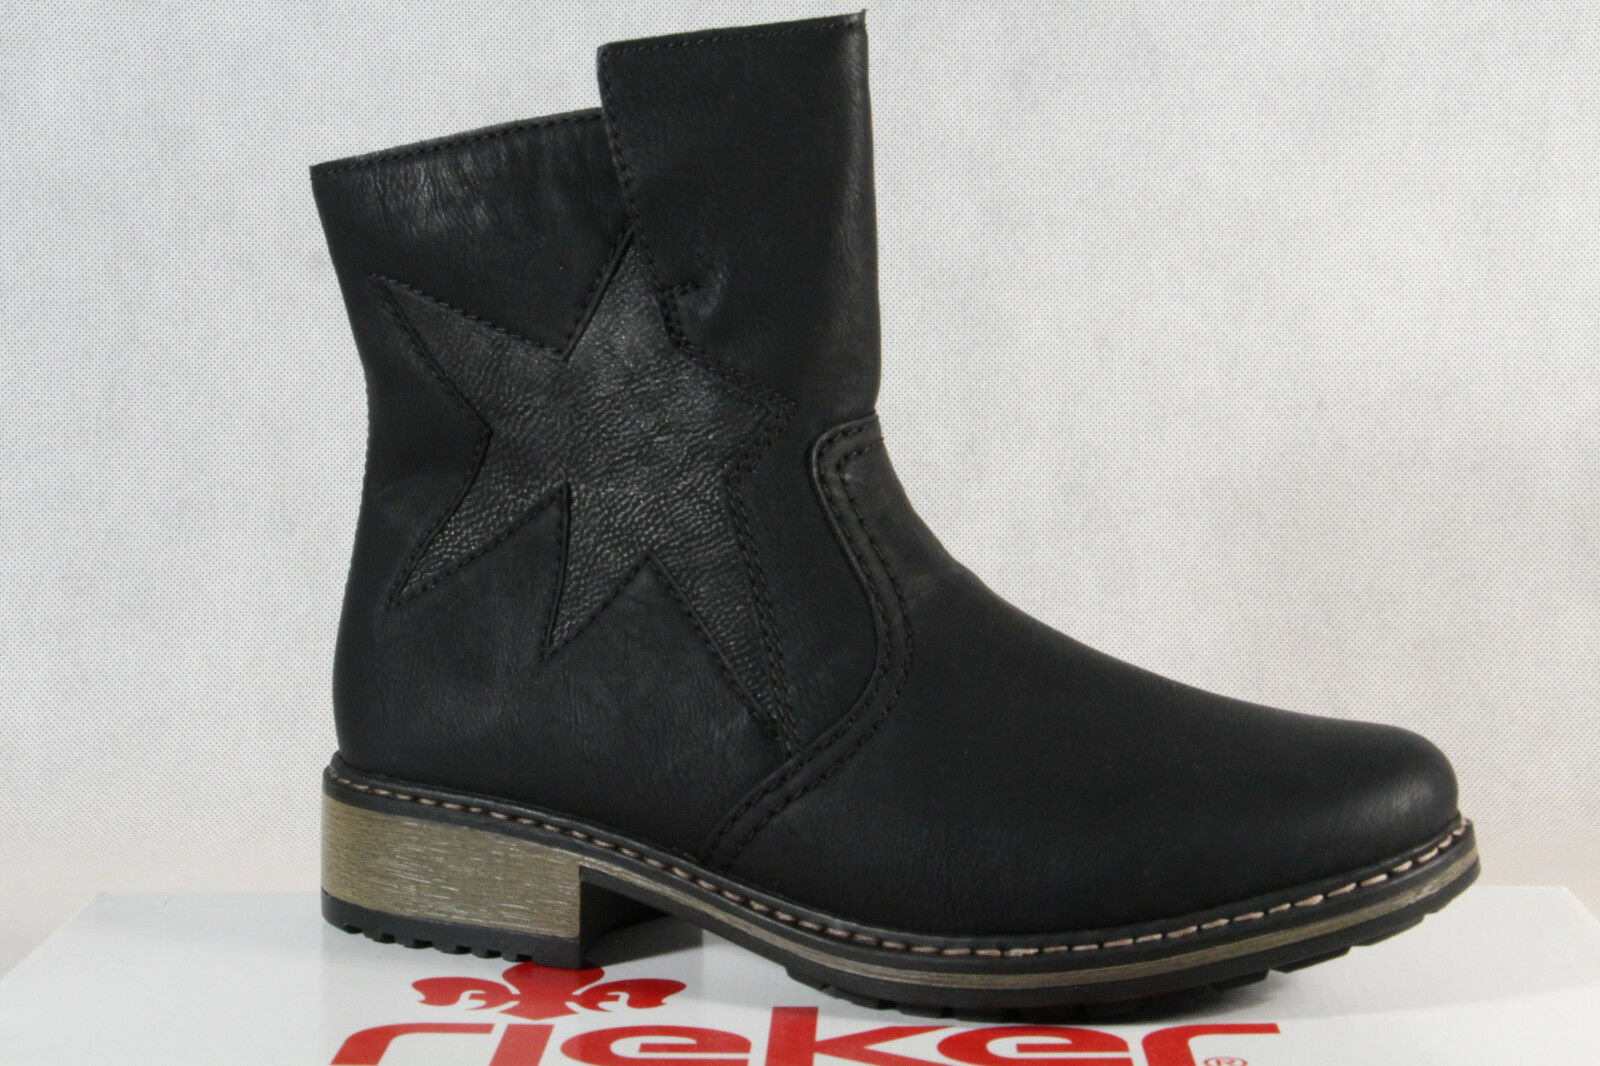 e1581553b318 Rieker Stiefel Stiefeletten Boots, Winterstiefel schwarz Z6865 NEU ...